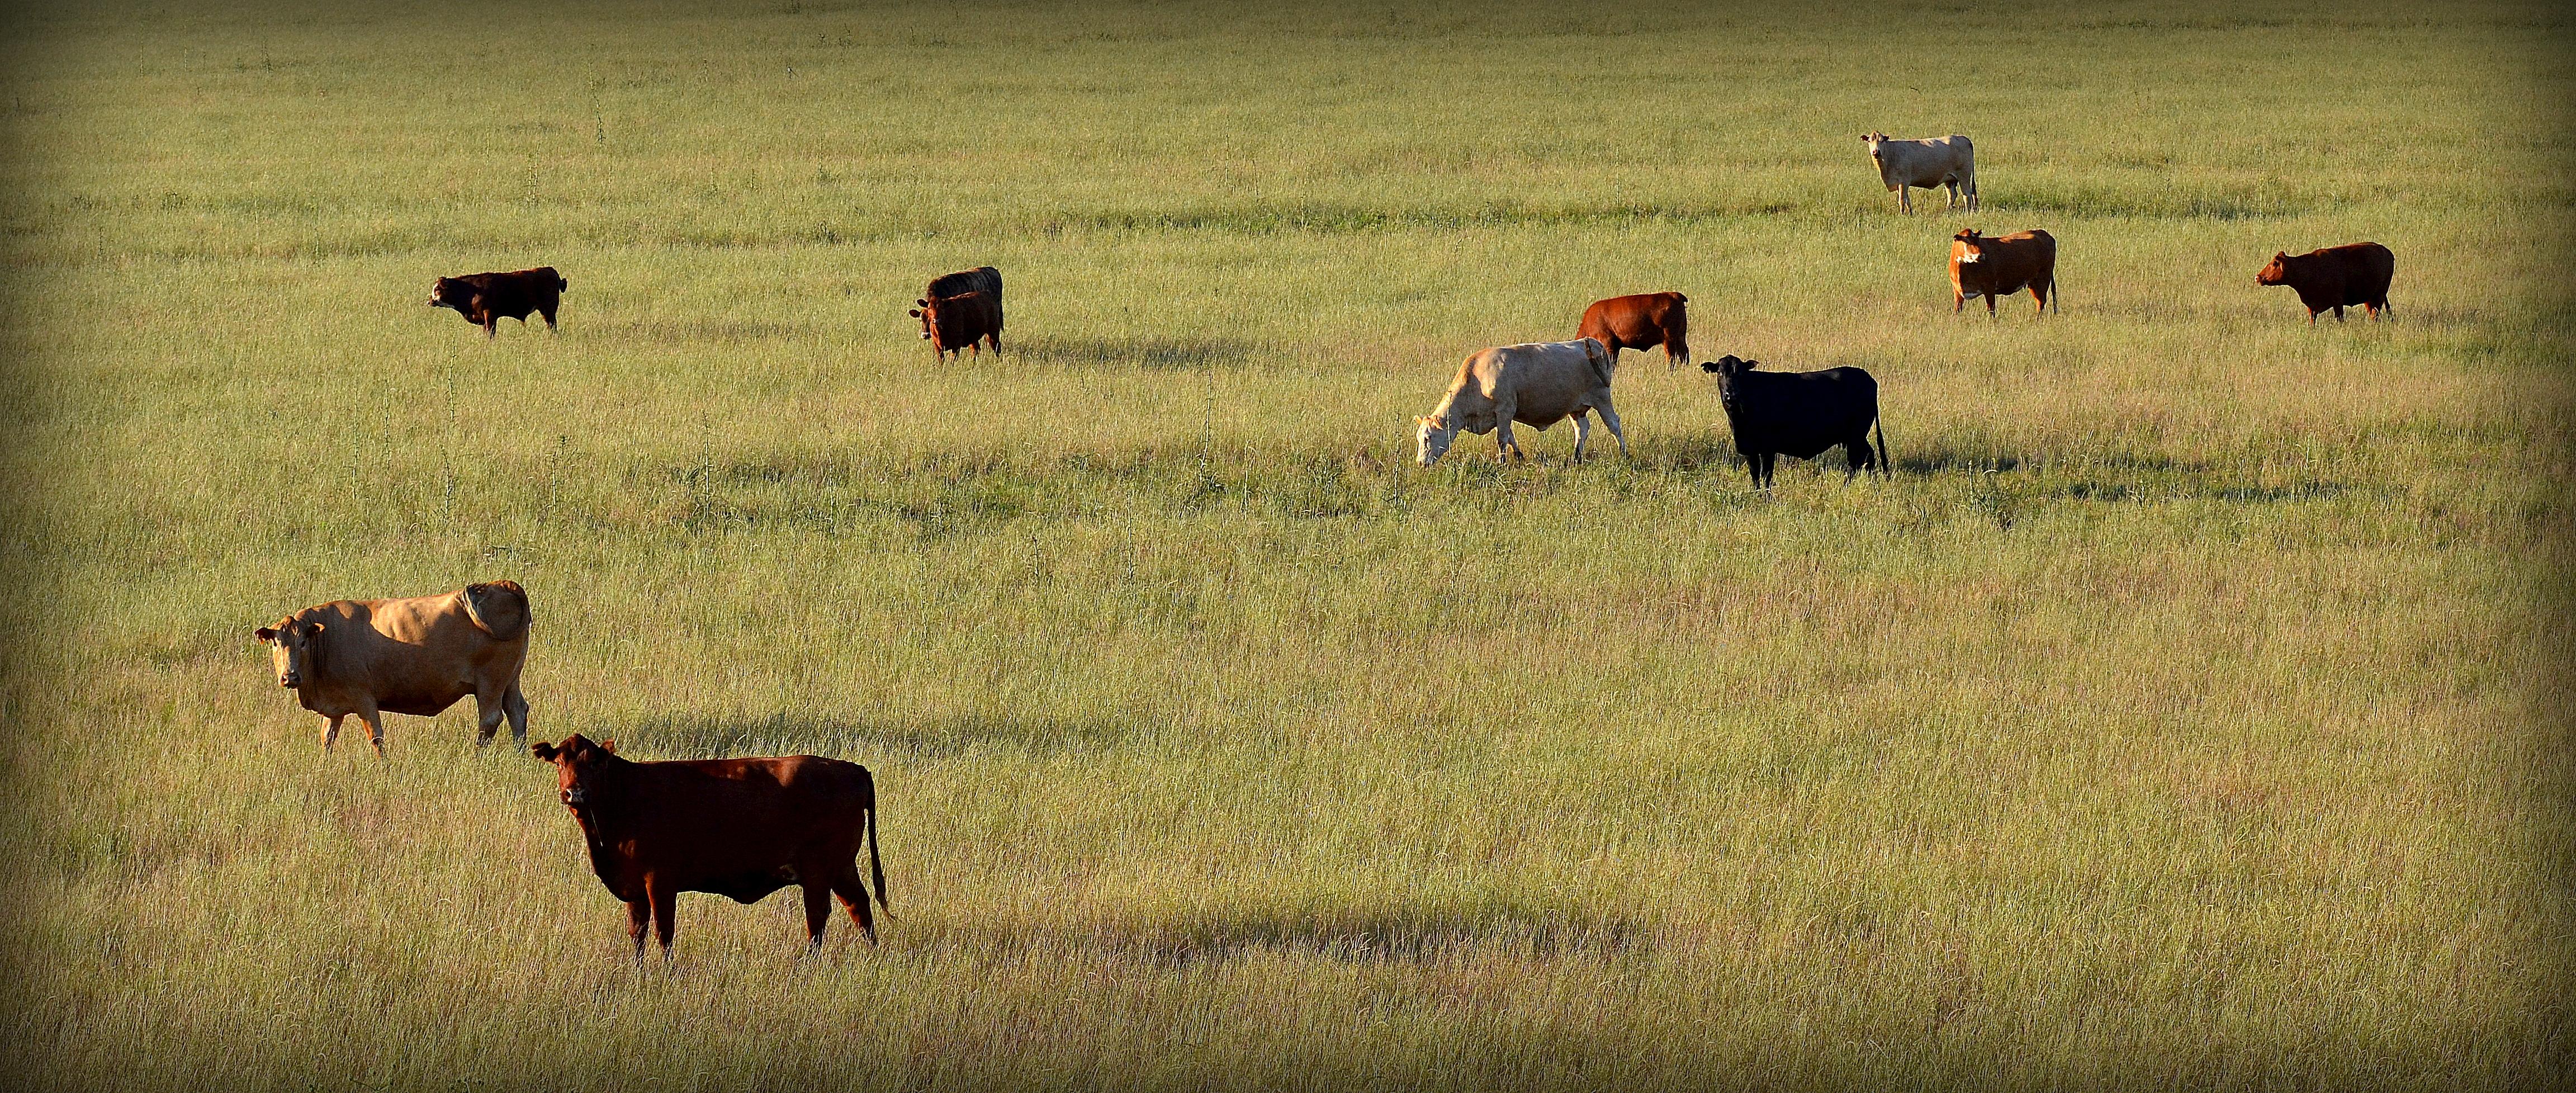 EU to discuss Brazil beef ban over Amazon fires